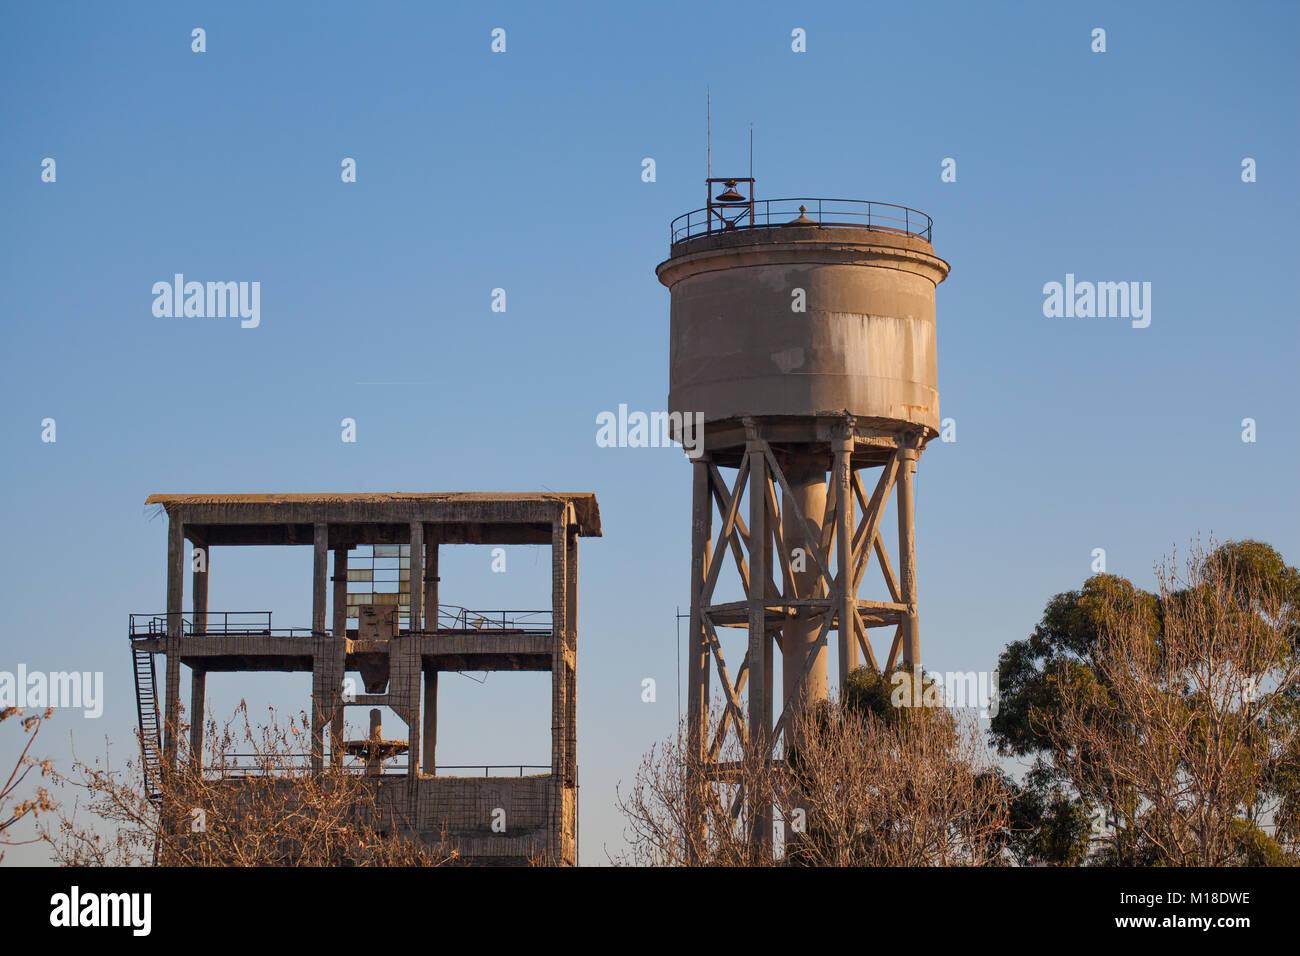 Cistern Tank Stock Photos & Cistern Tank Stock Images - Alamy